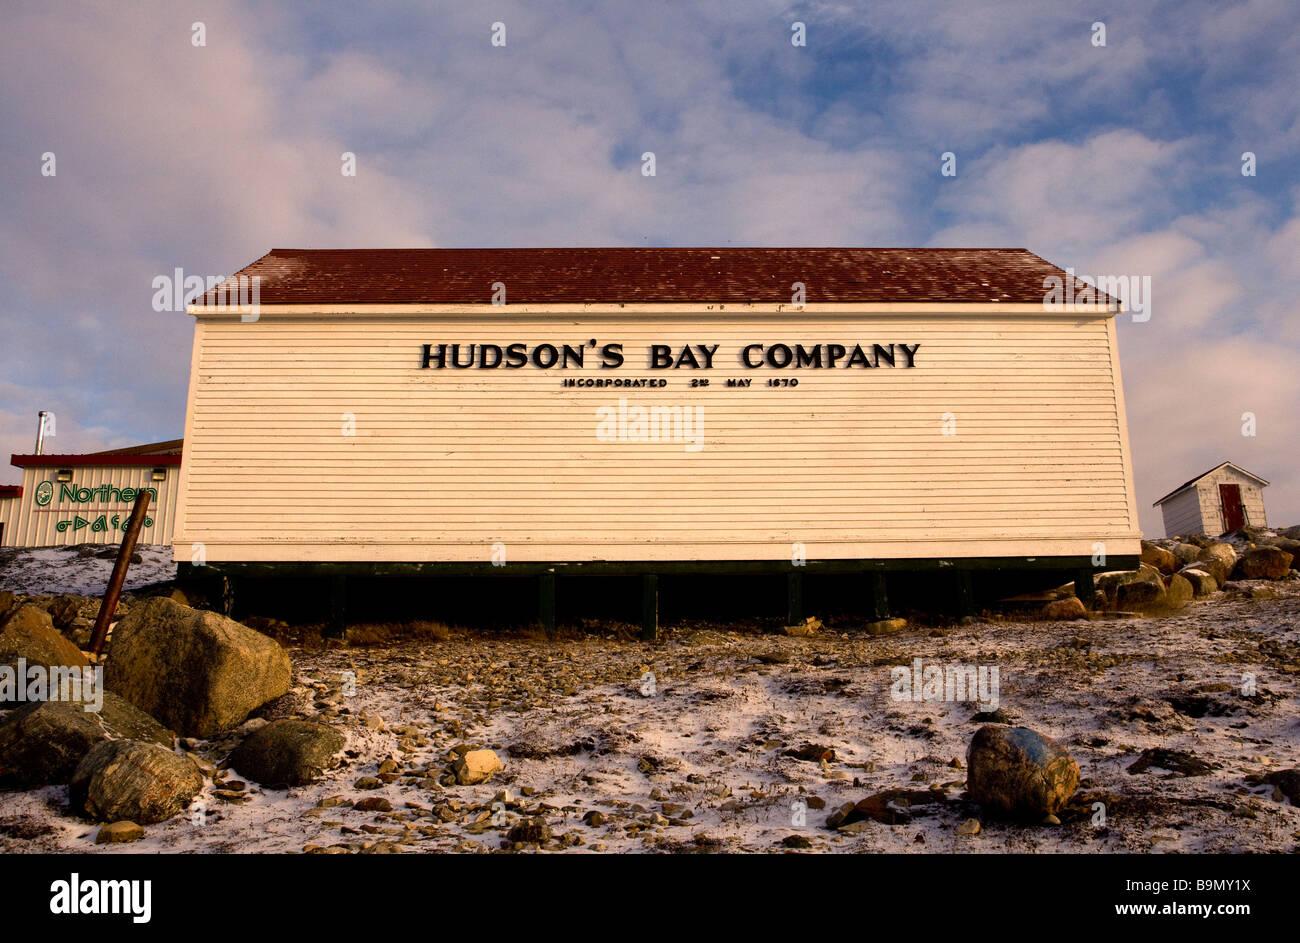 Hudson's Bay Company store in Taloyoak inuit settlement Nunavut, Canadian arctic, Canada - Stock Image